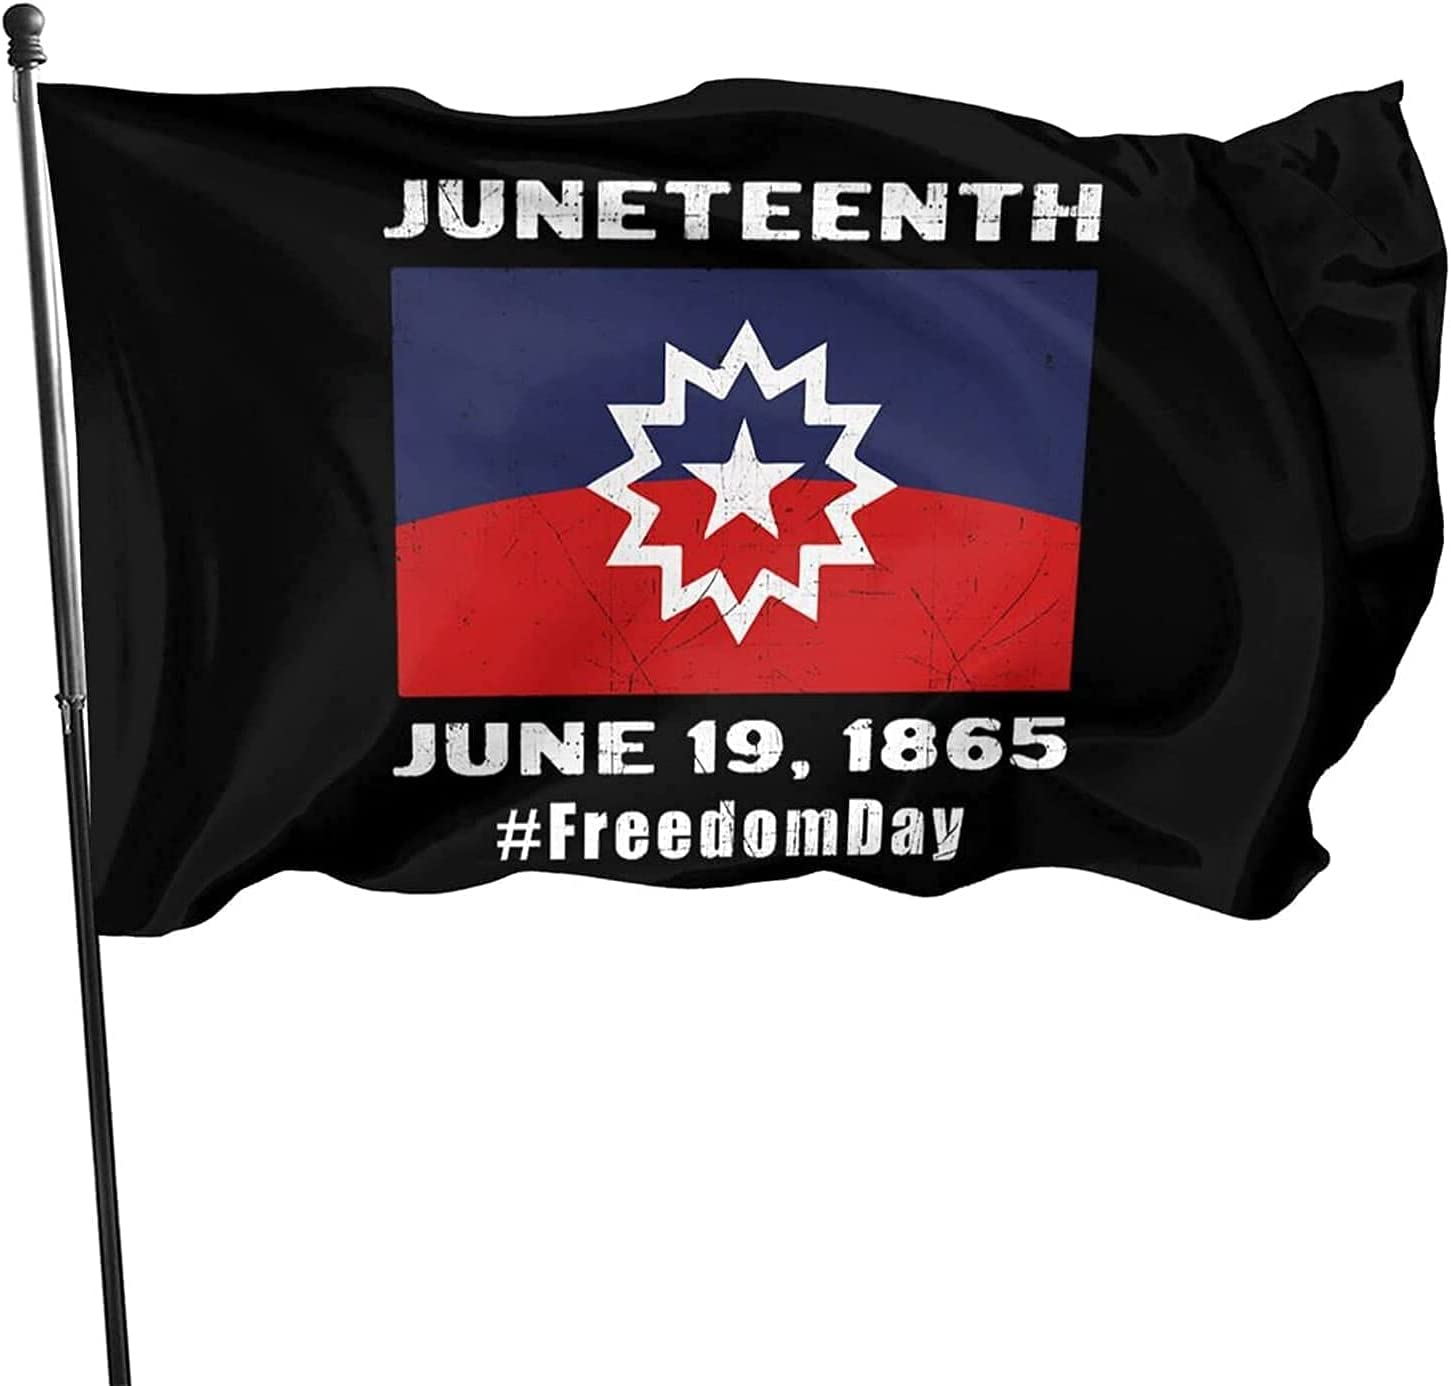 coolcool Juneteenth Day Outdoor Flag Home Garden Flag Banner Breeze Flags for Home Decor 3x5 Foot-A10